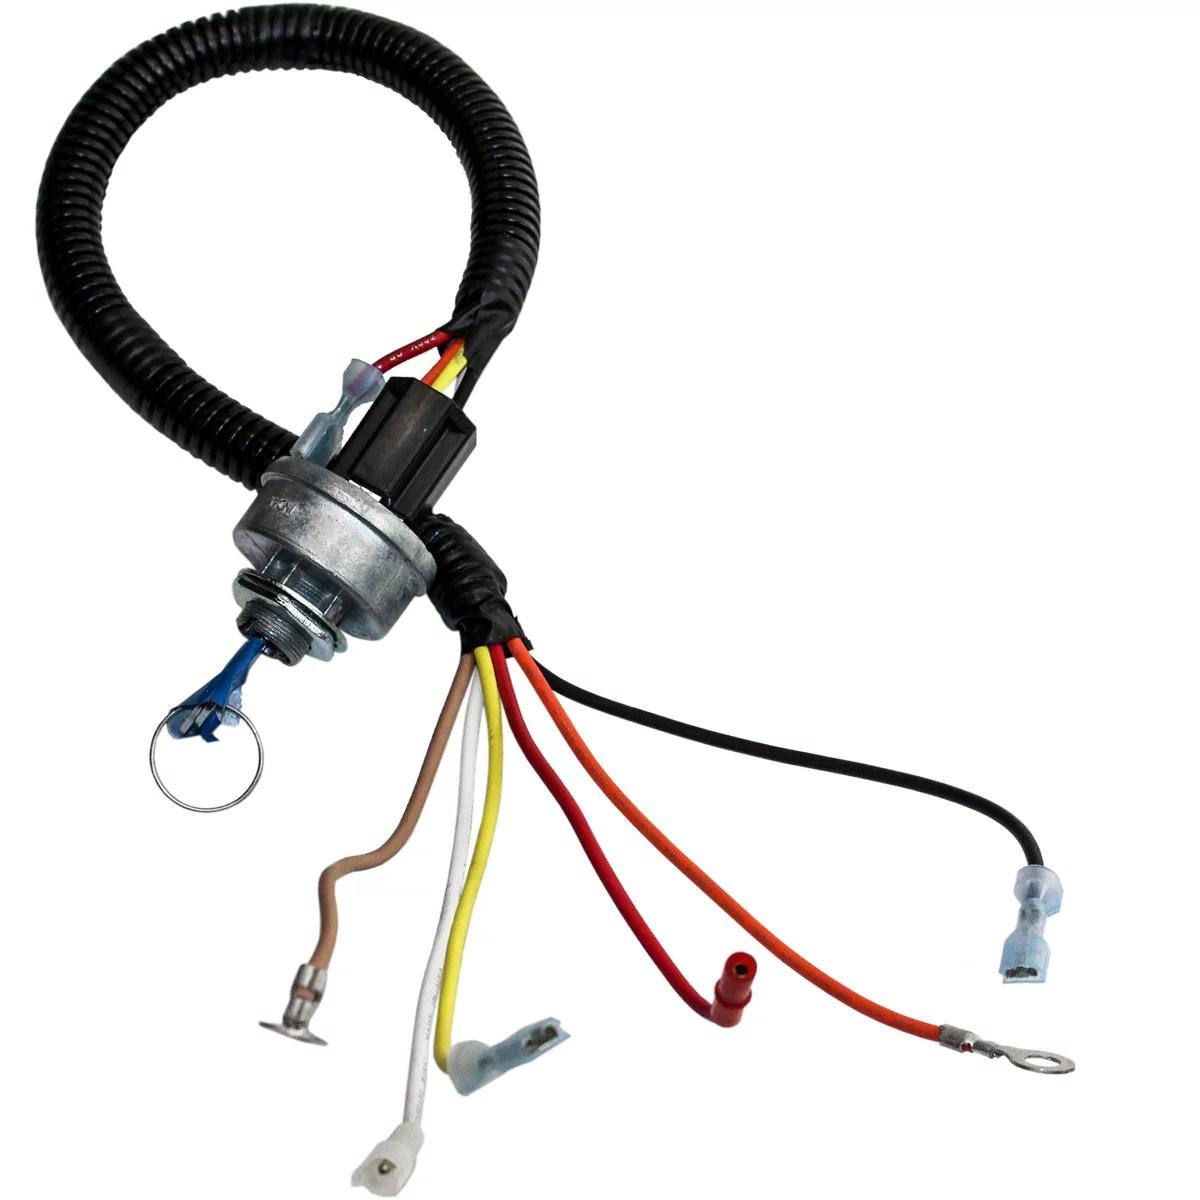 briggs vanguard engine switch kit with wiring cushman 692318 bs vanguard wiring harness source vanguard wiring diagram wiring diagram page 23 hp  [ 1200 x 1200 Pixel ]